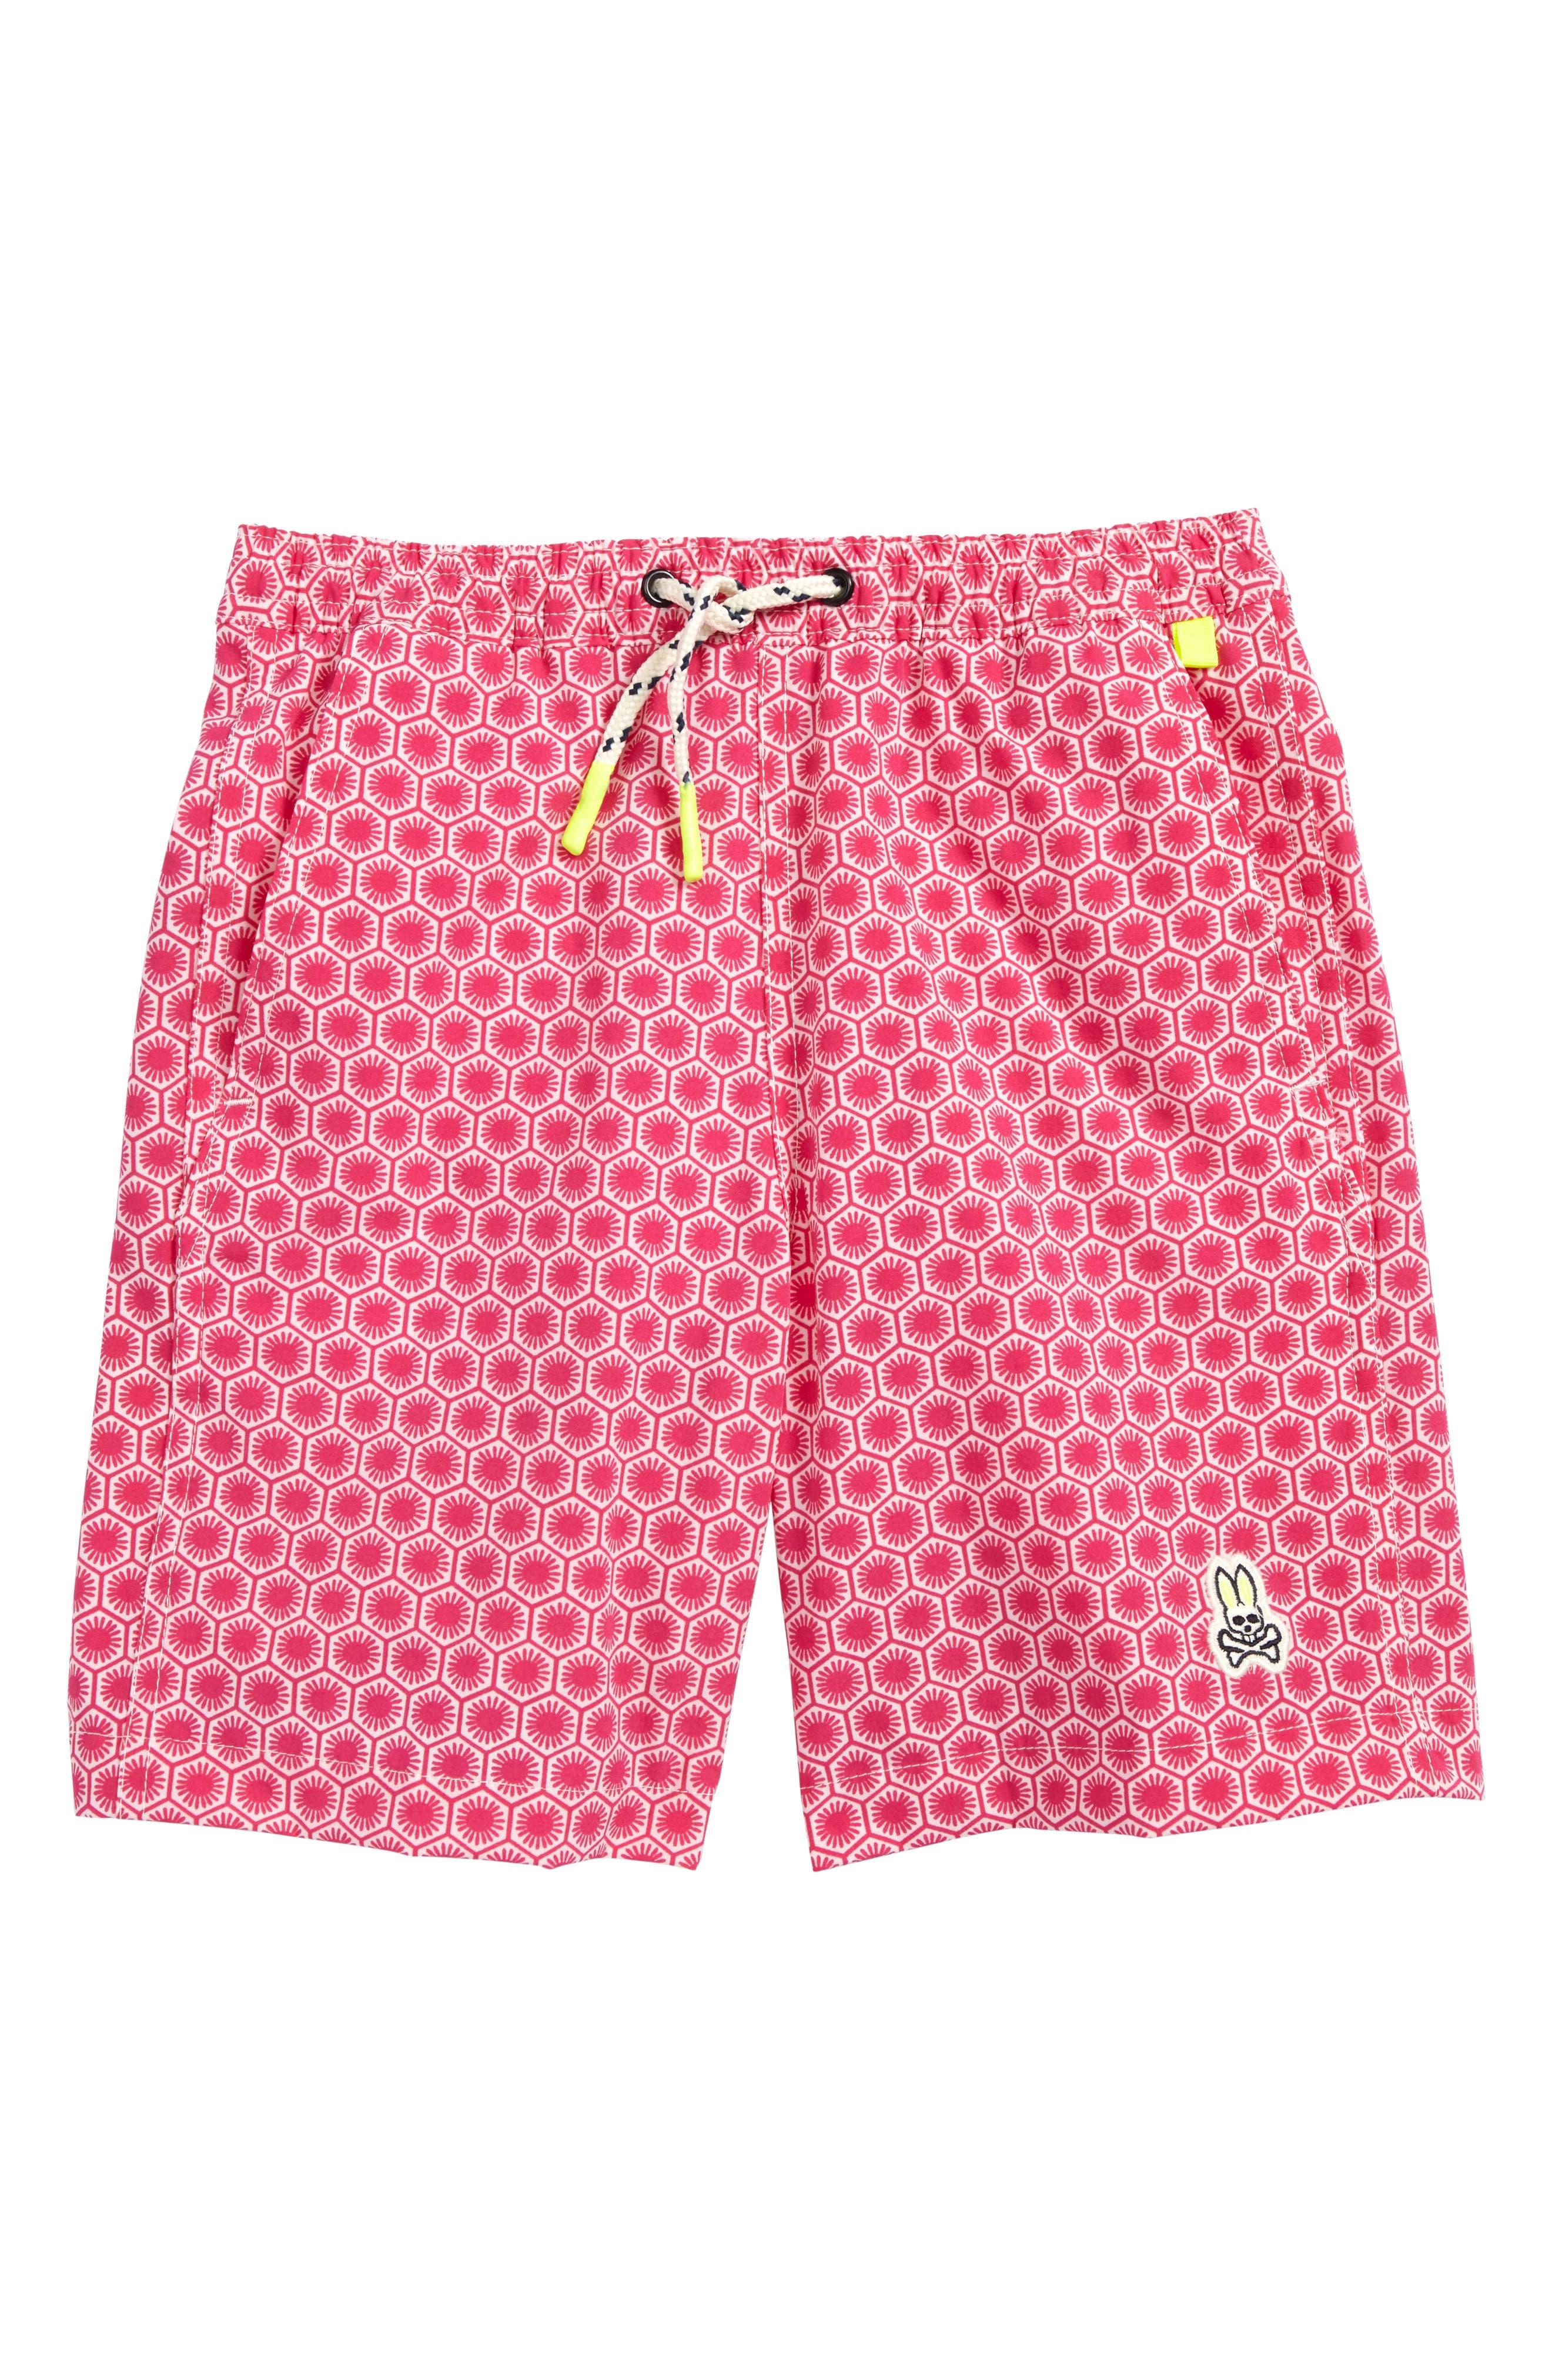 Alternate Image 1 Selected - Psycho Bunny Honeycomb Board Shorts (Little Boys & Big Boys)